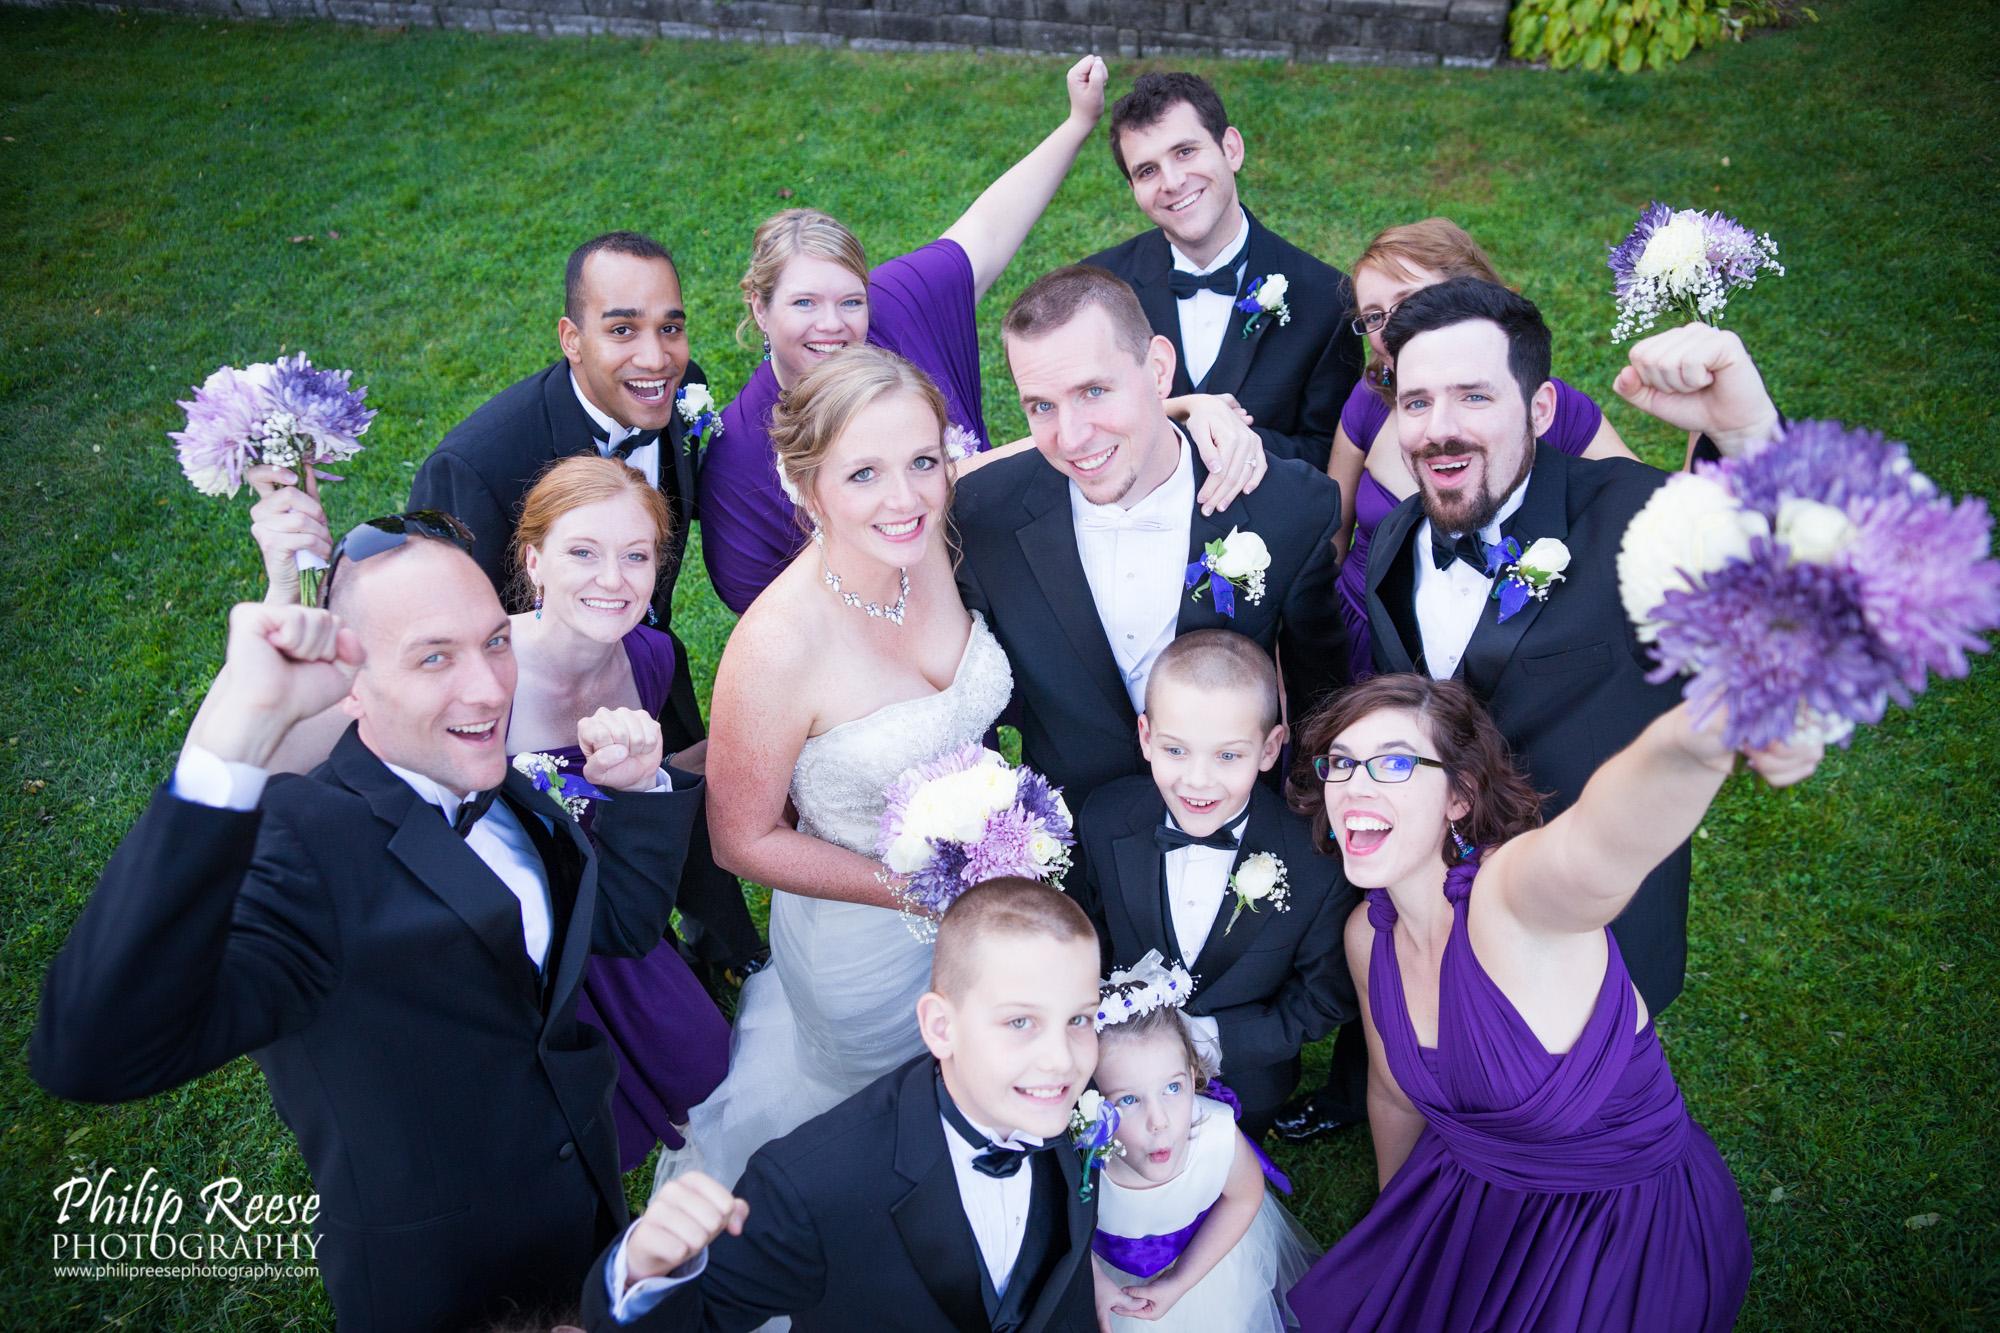 Bruder Wedding 181 - 06506.jpg